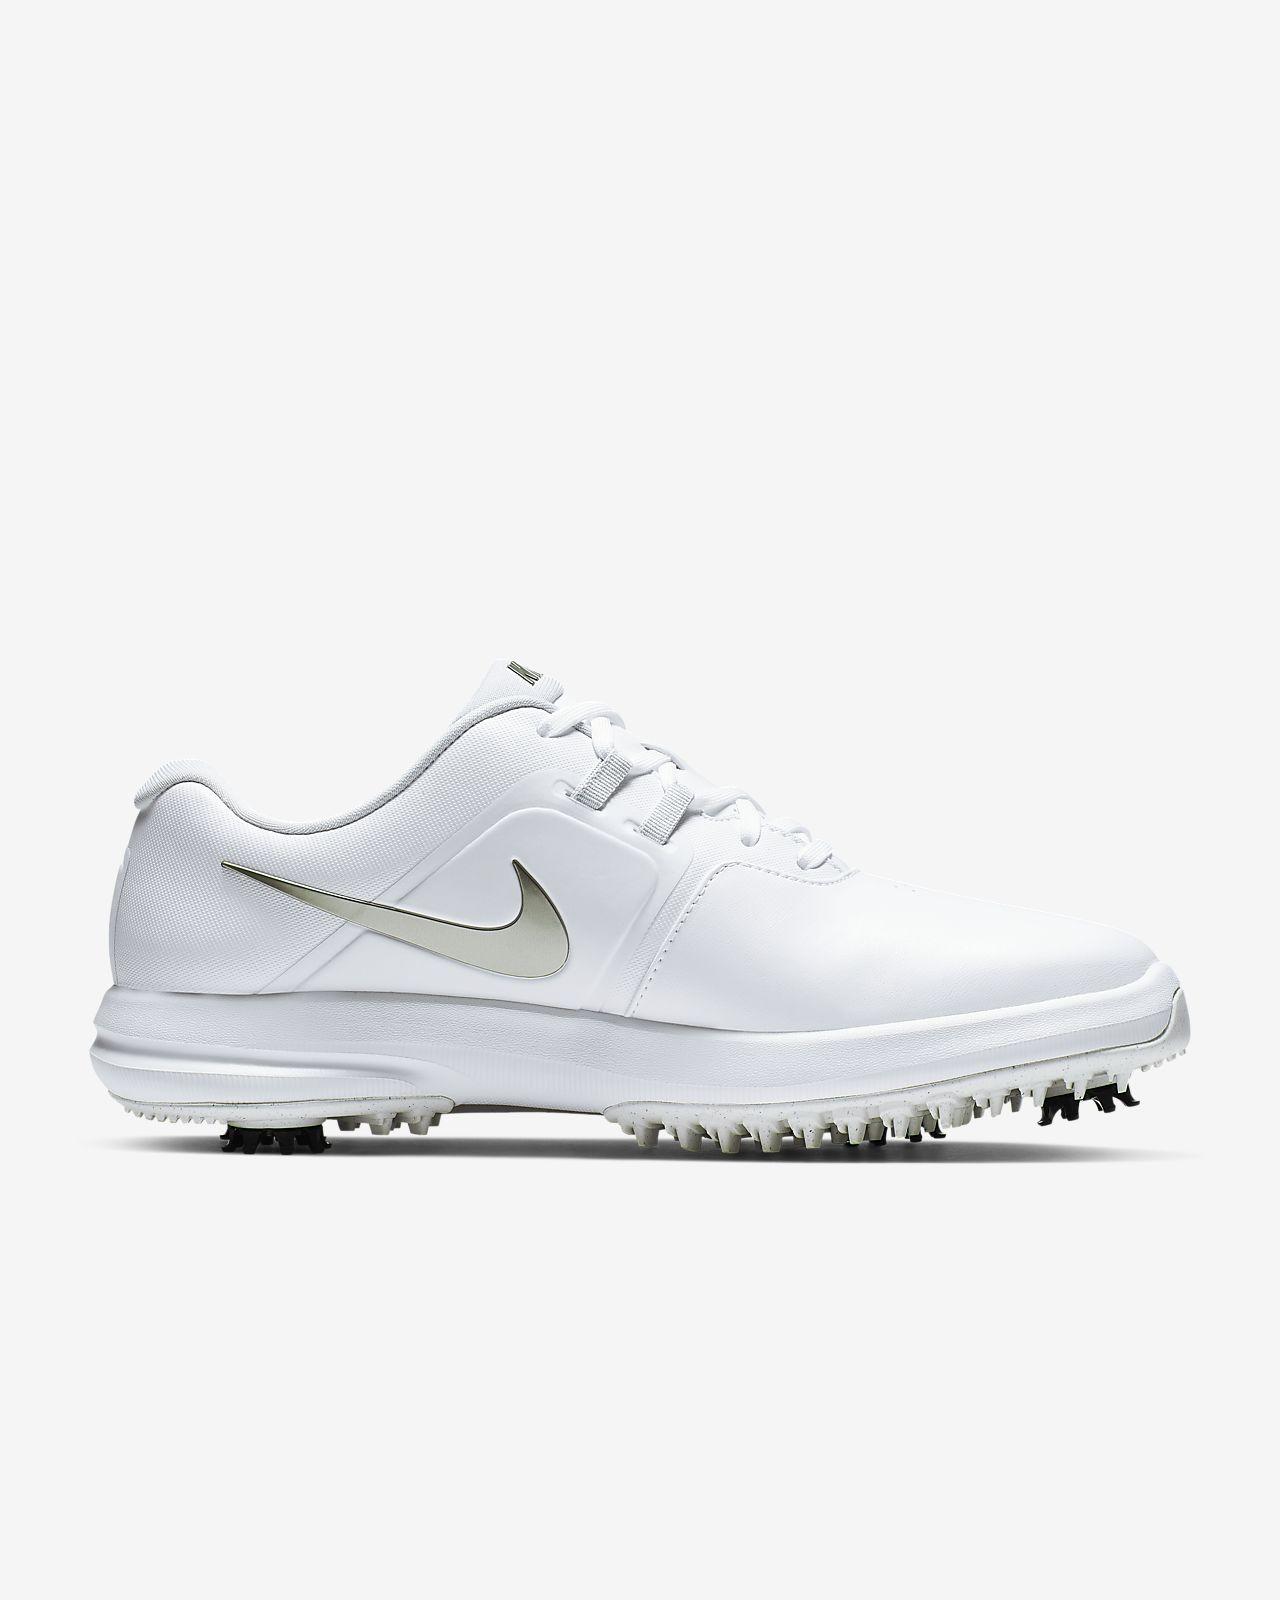 timeless design 5da57 f3d05 ... Nike Air Zoom Victory Men s Golf Shoe